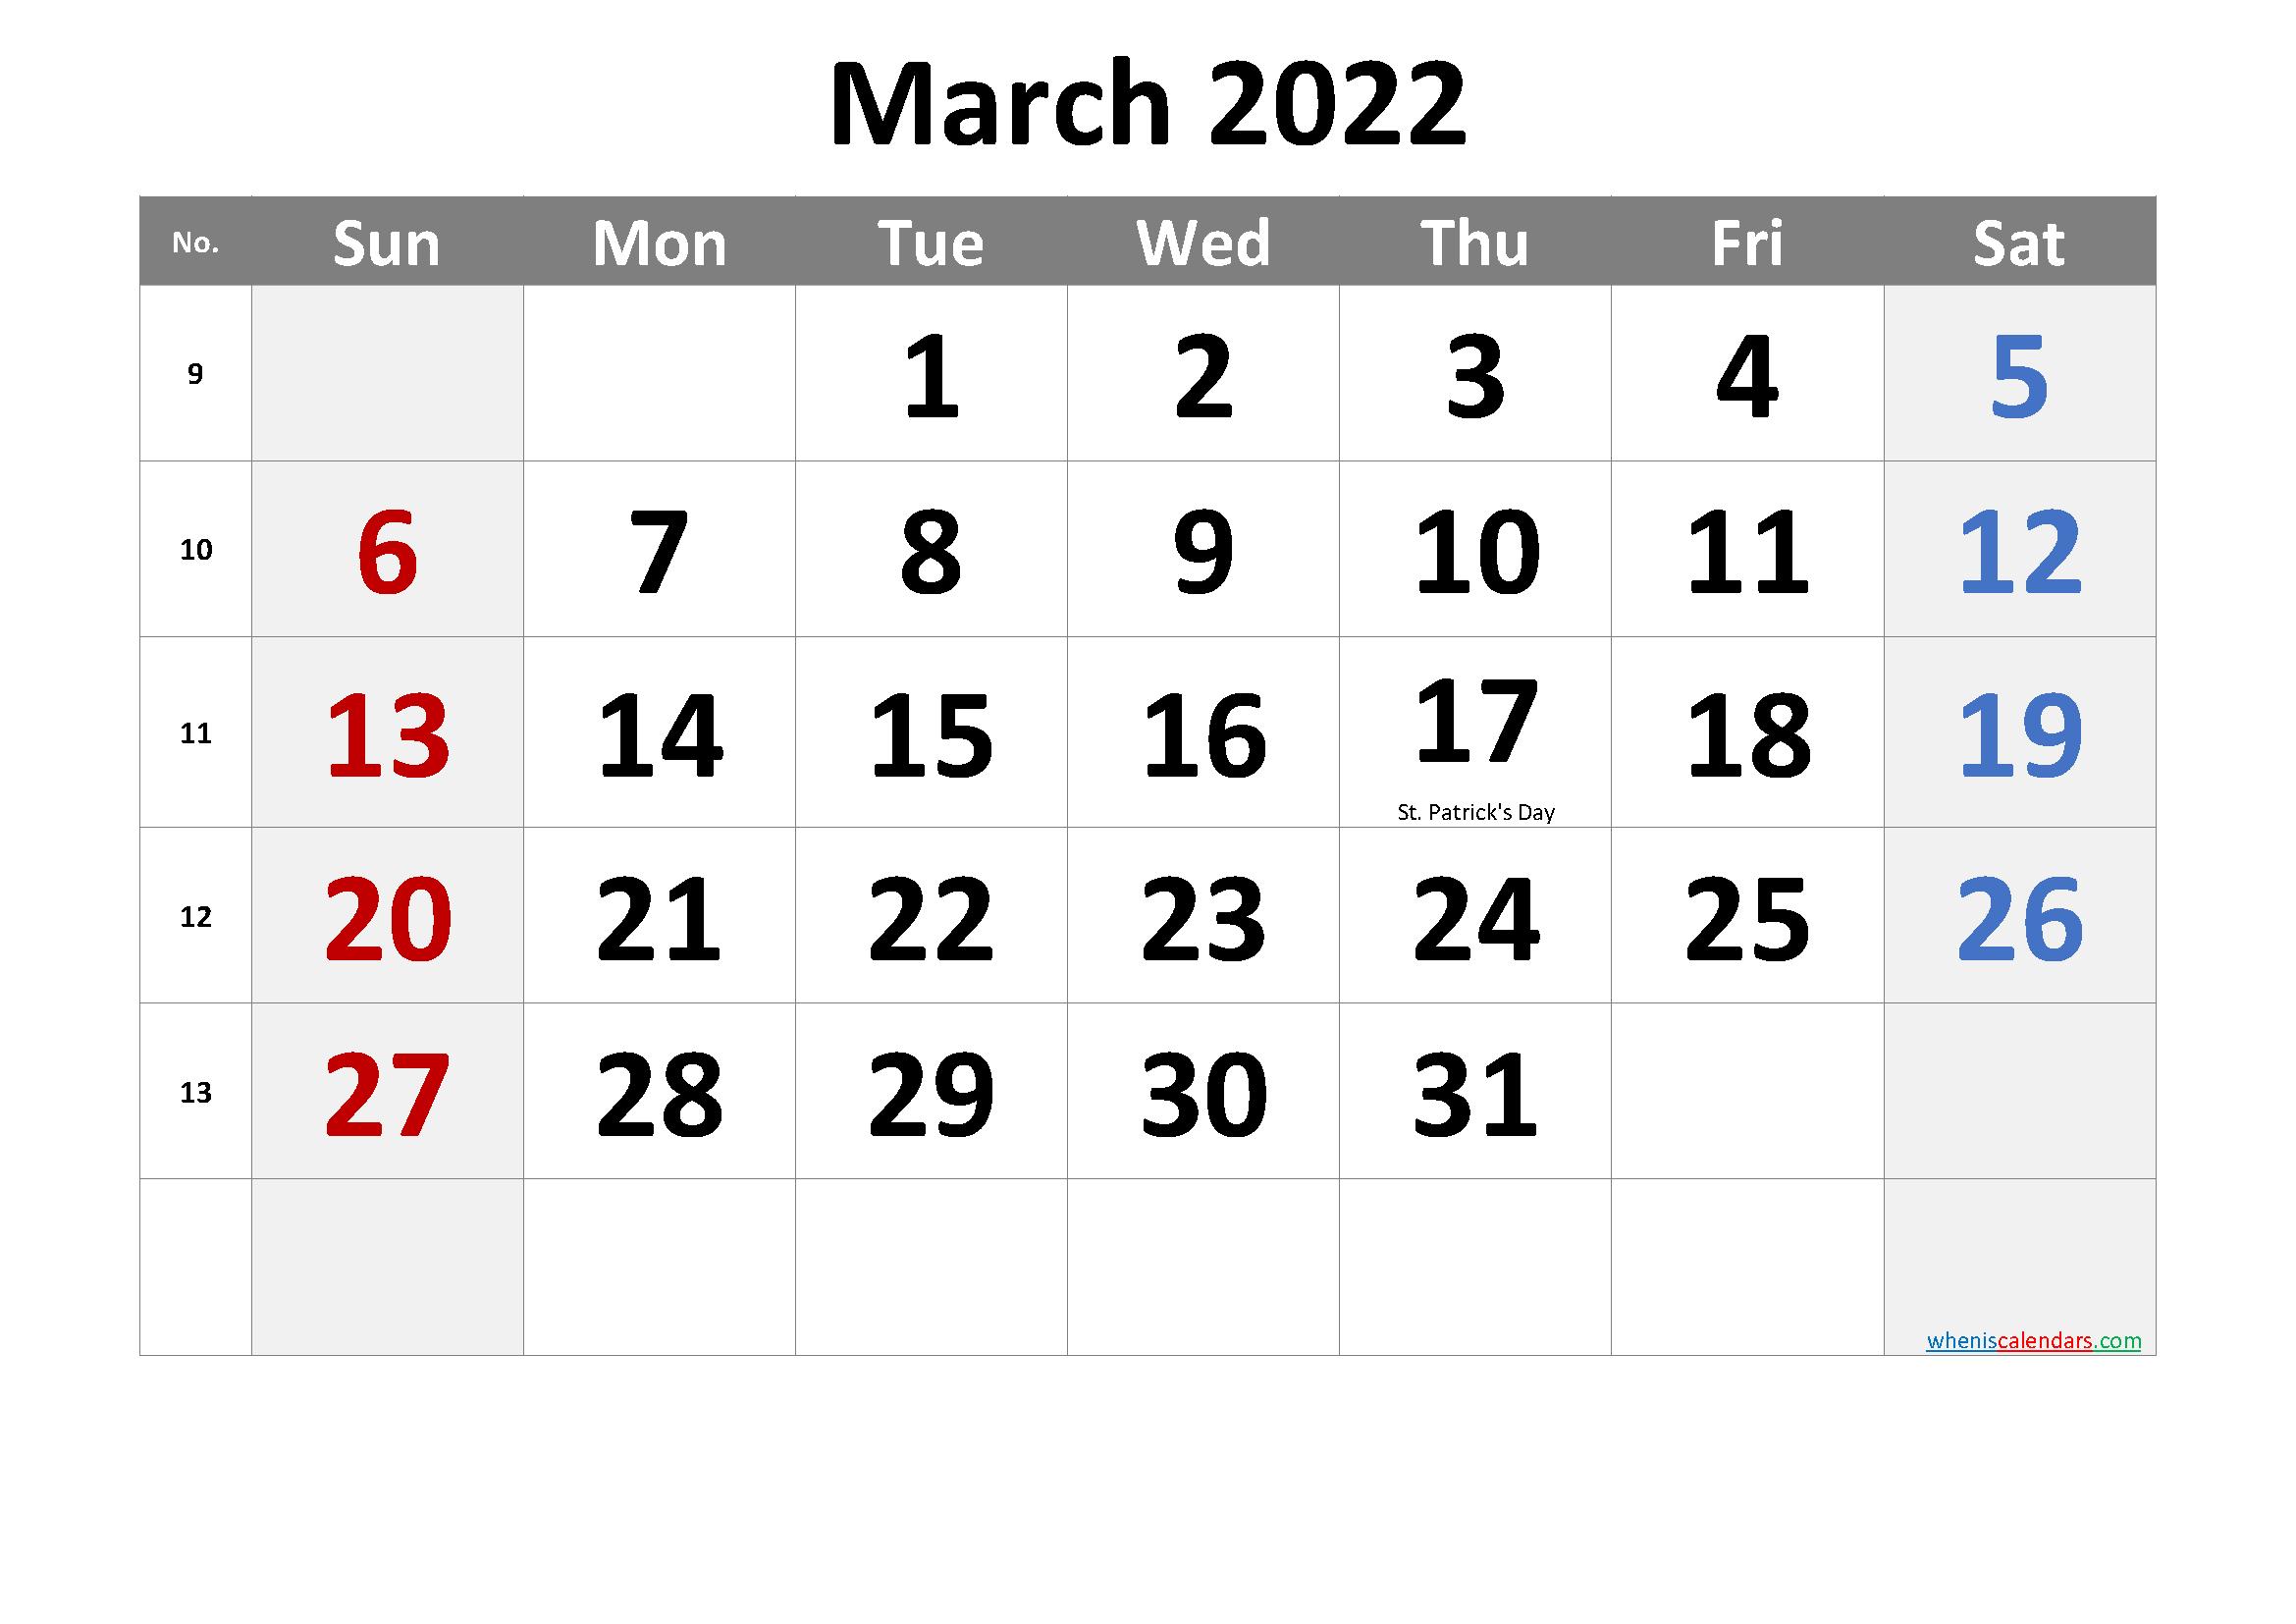 March 2022 Printable Calendar With Holidays Regarding Calendar Of March 2022